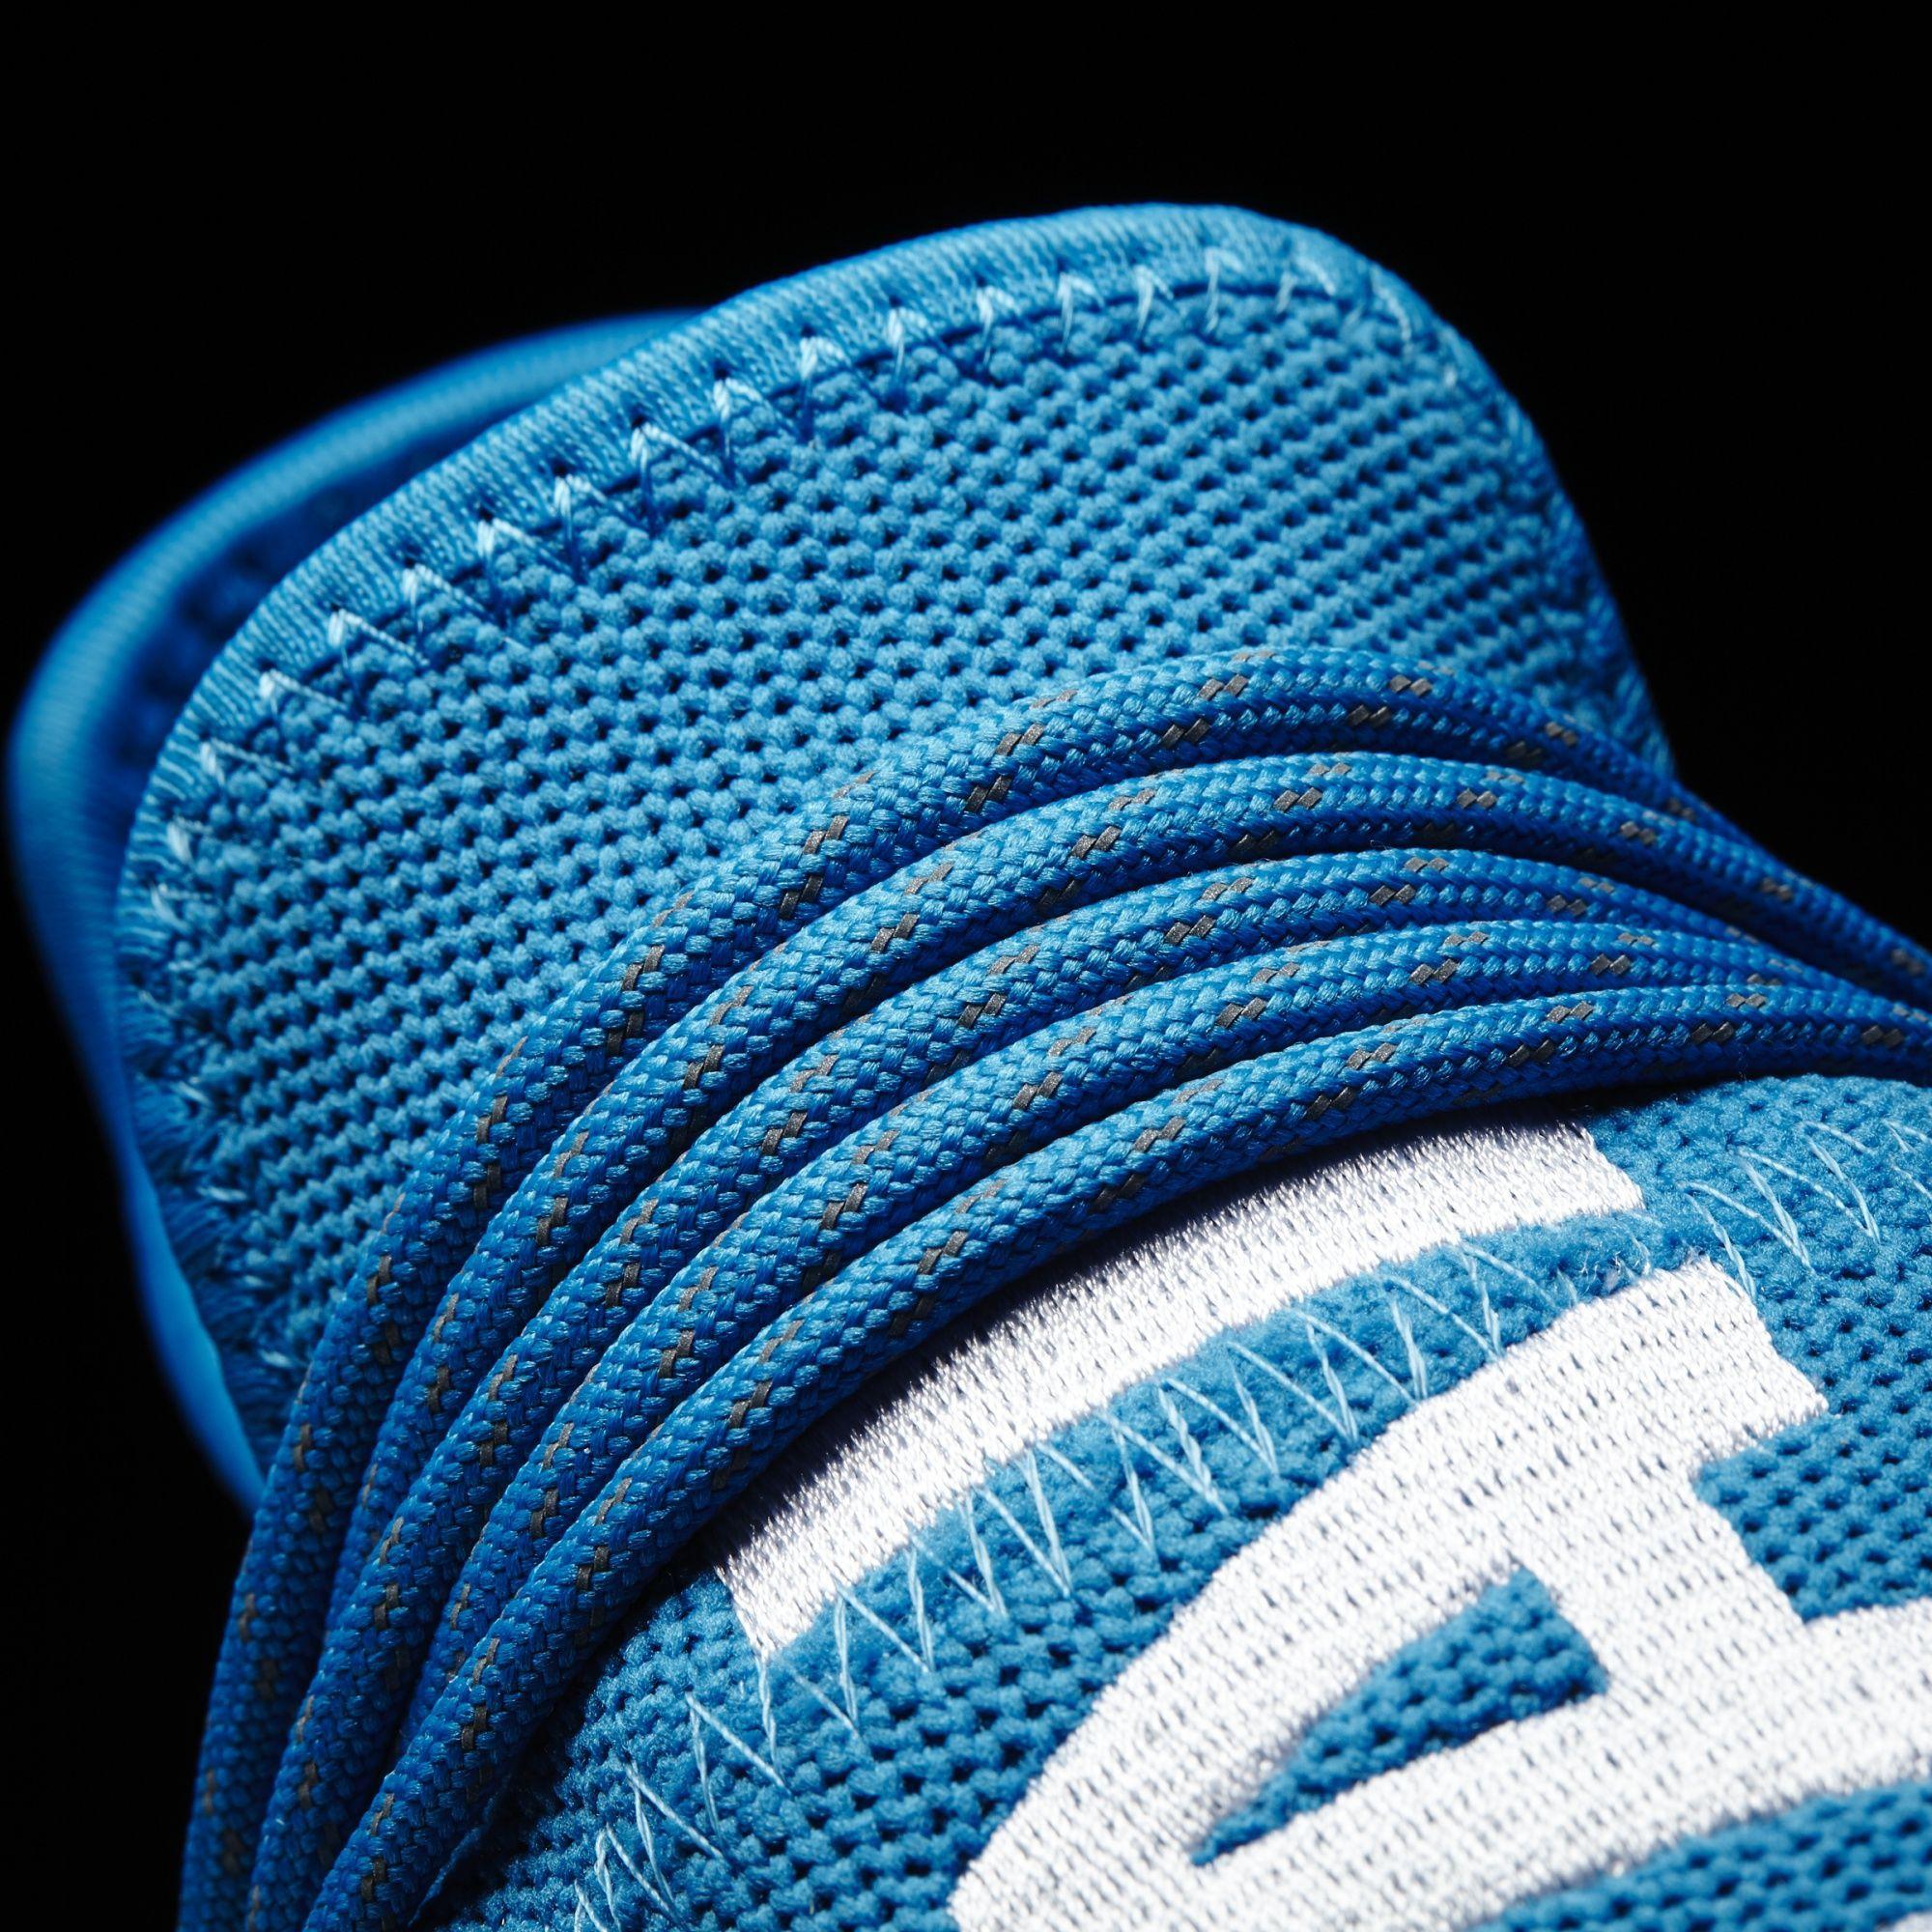 Blue Pharrell adidas NMD Human Race Lace  9fe42af18b